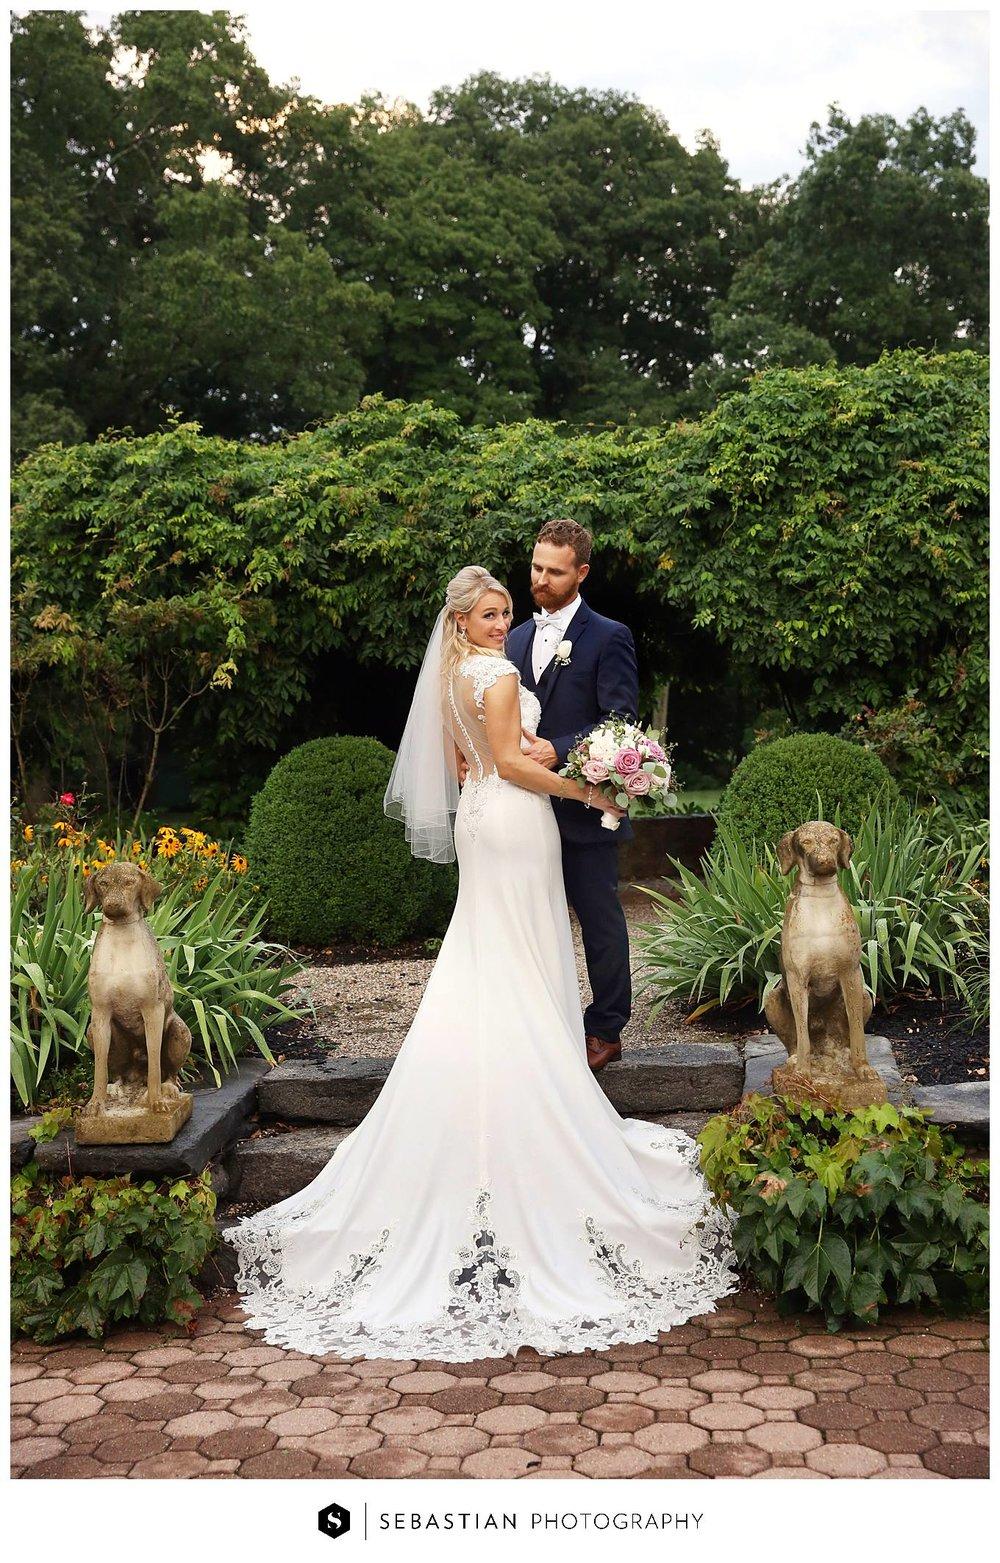 Sebastian Photography_Saint Clements Castle Wedding_CT Wedding Photographer__7045.jpg